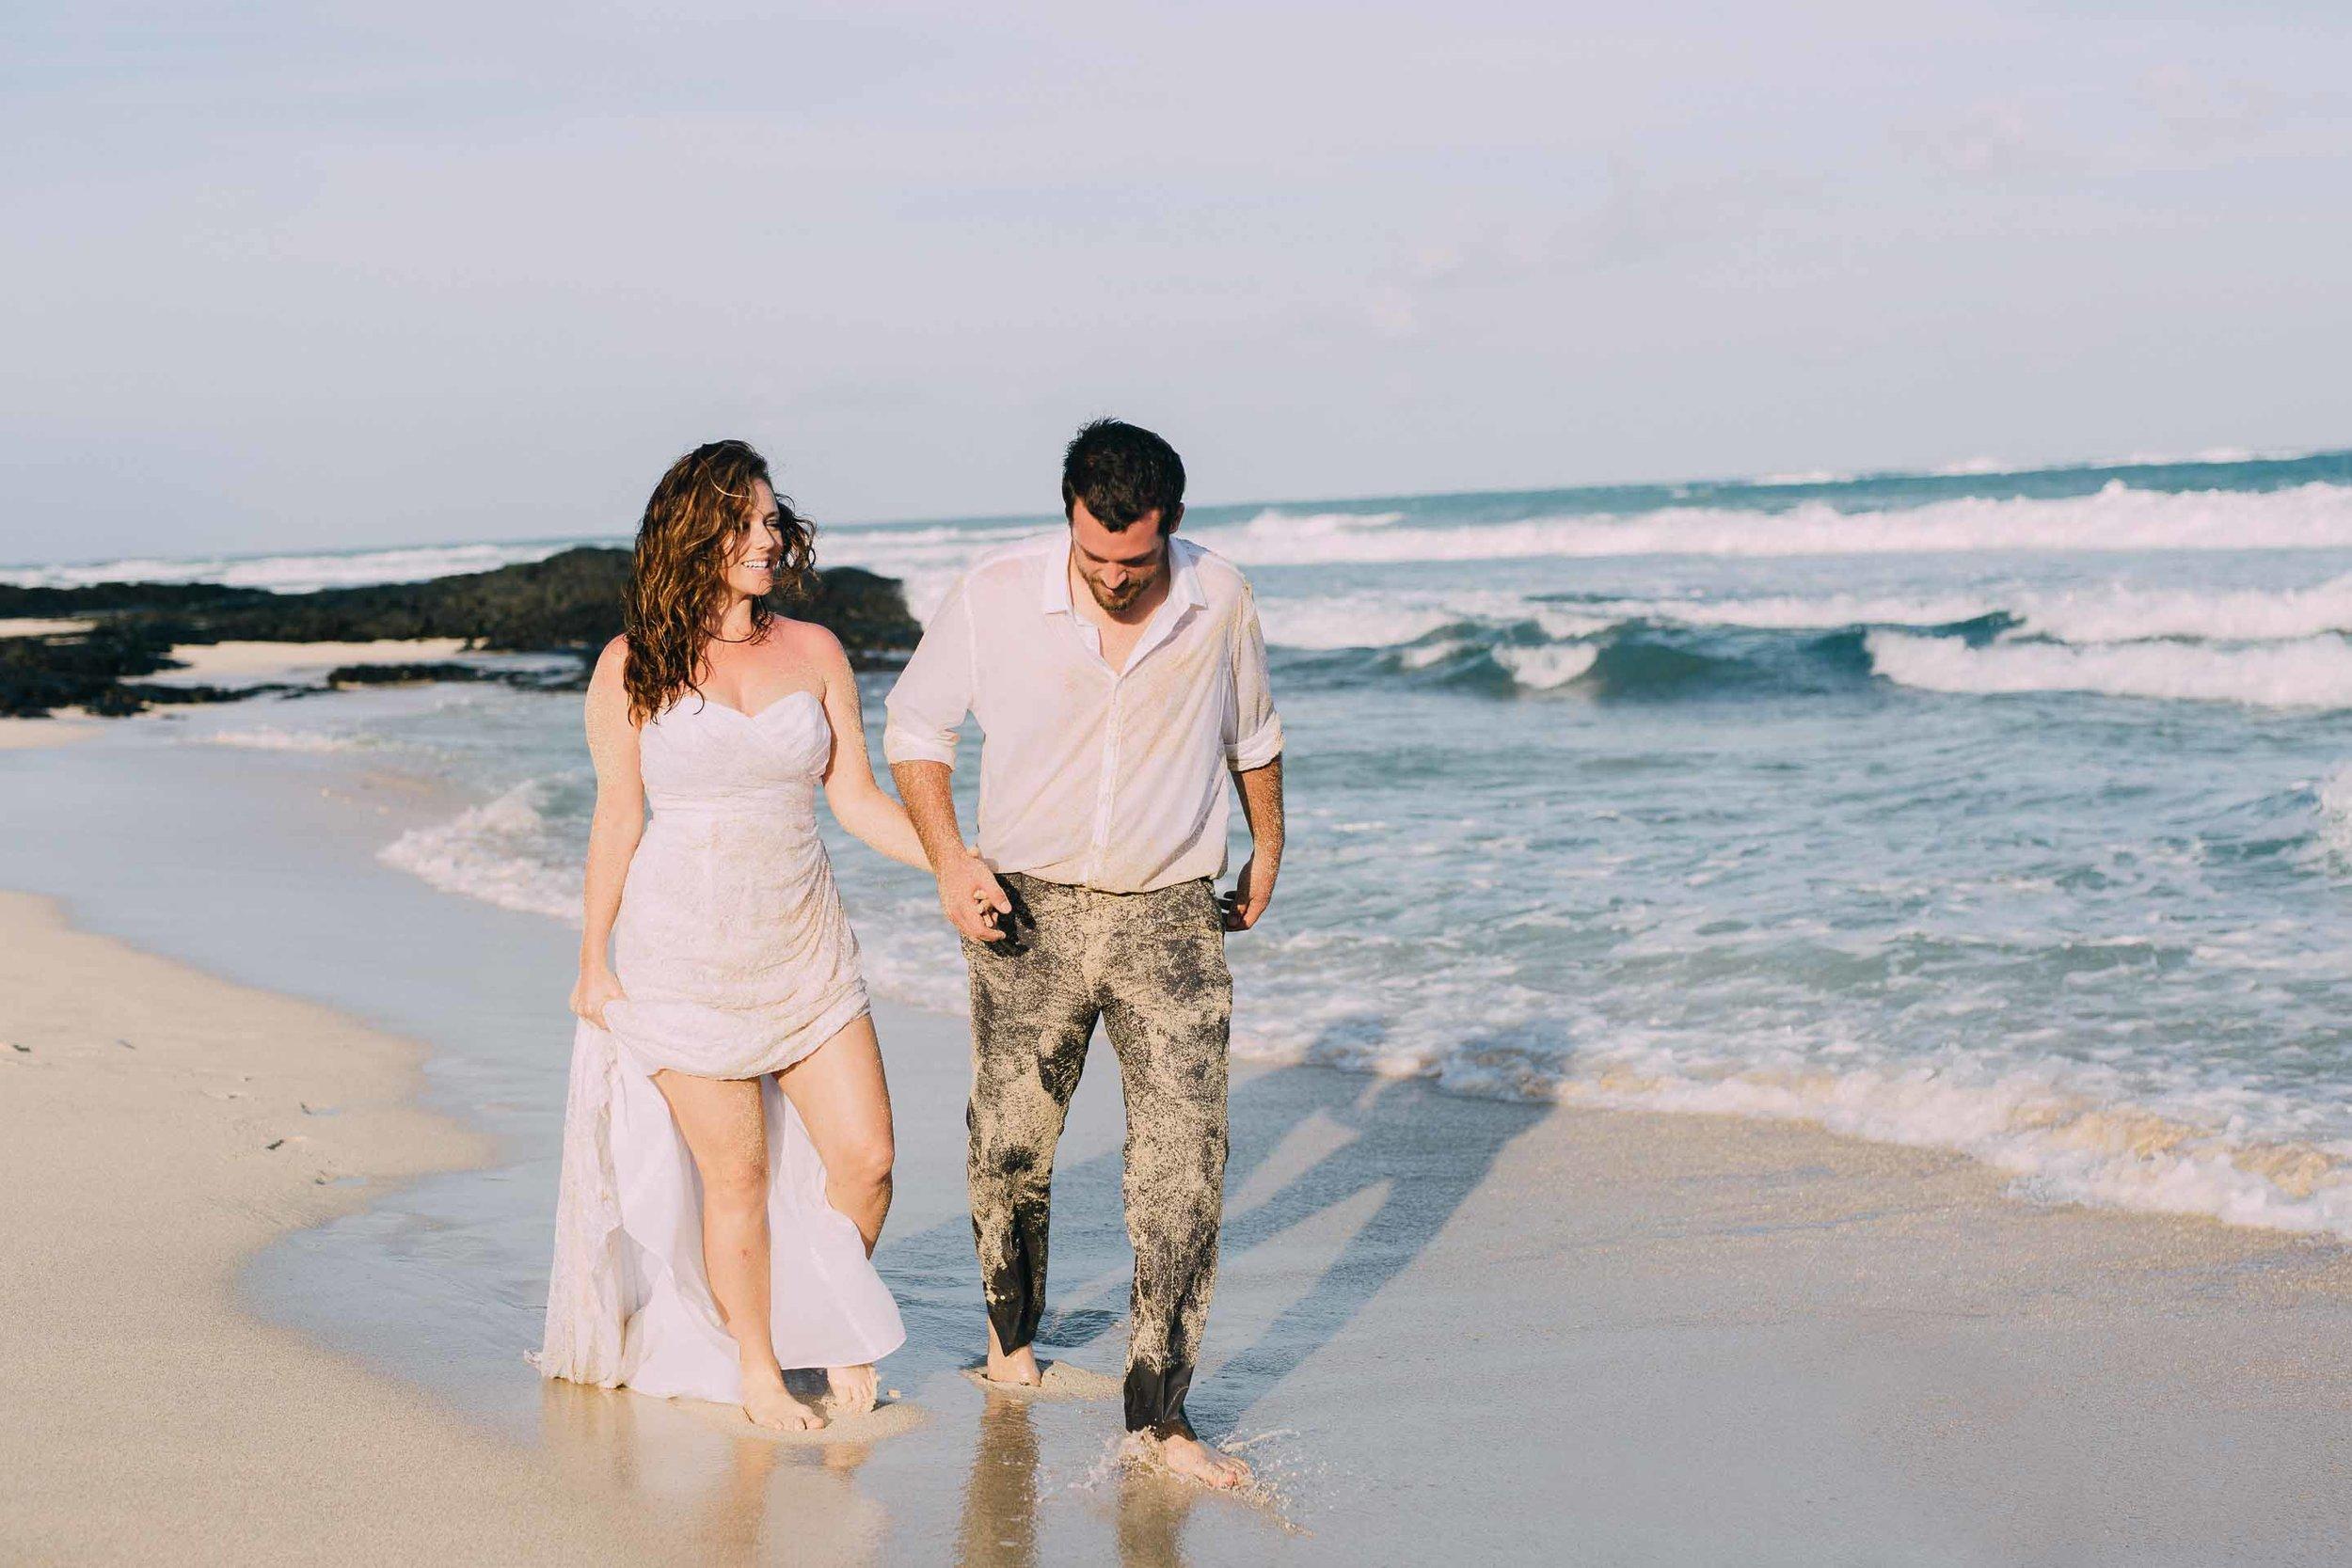 Recently married couple walk on beach in wedding attire